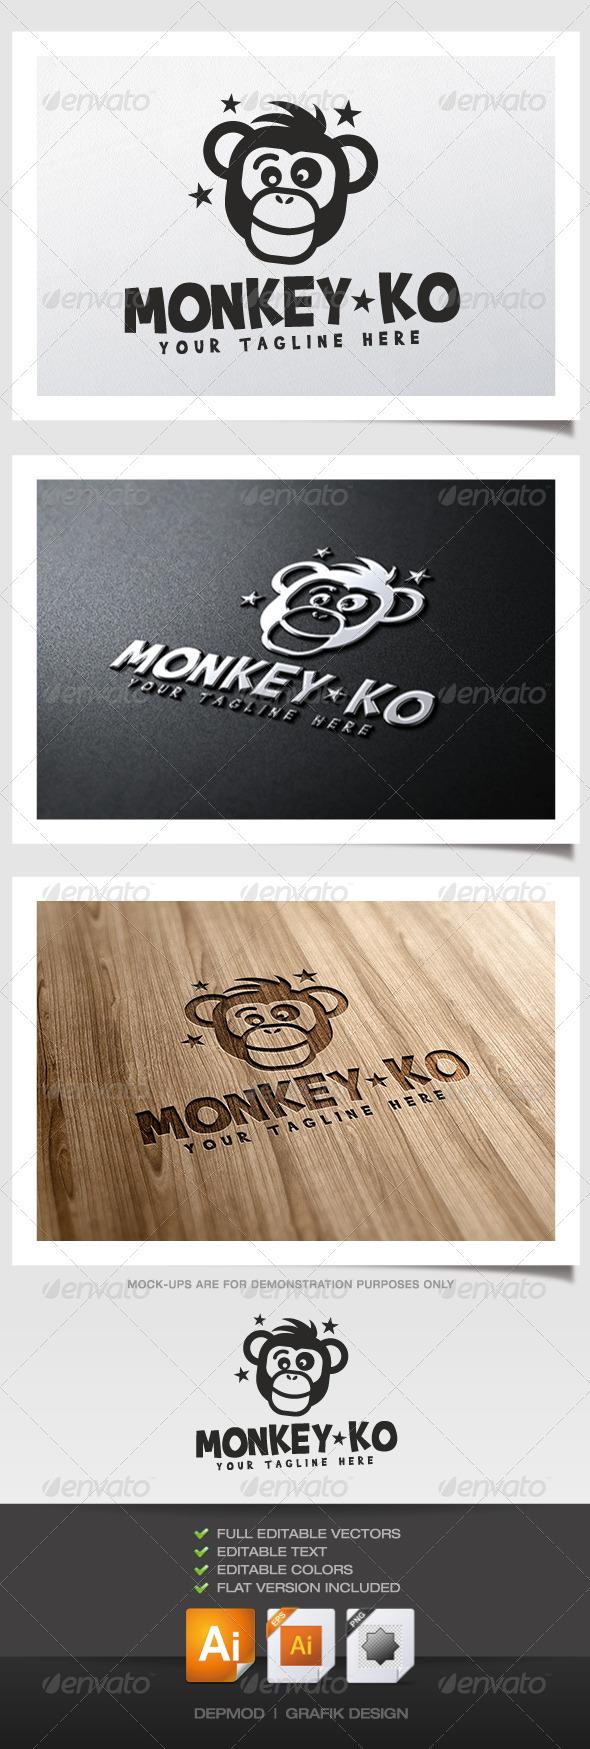 GraphicRiver Monkey KO Logo 5345686